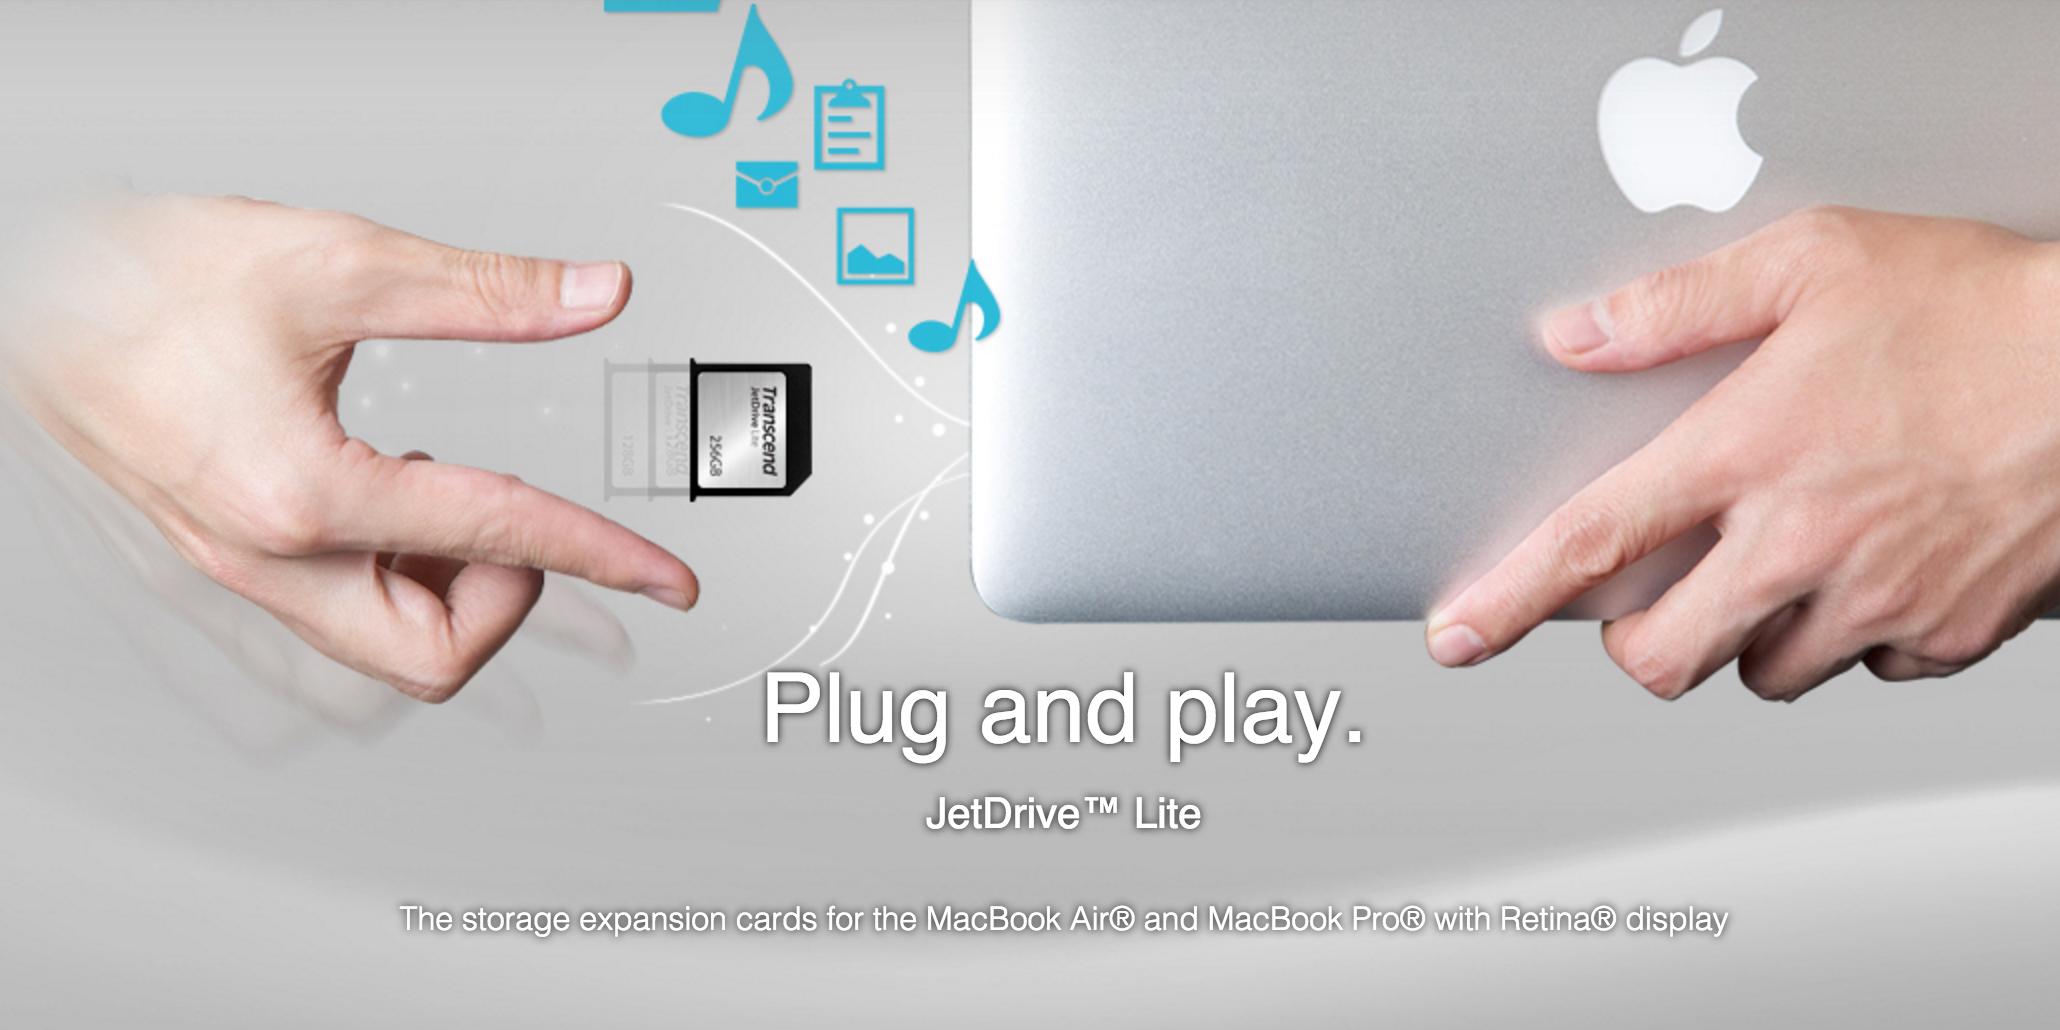 jetdrive-lite-macbook